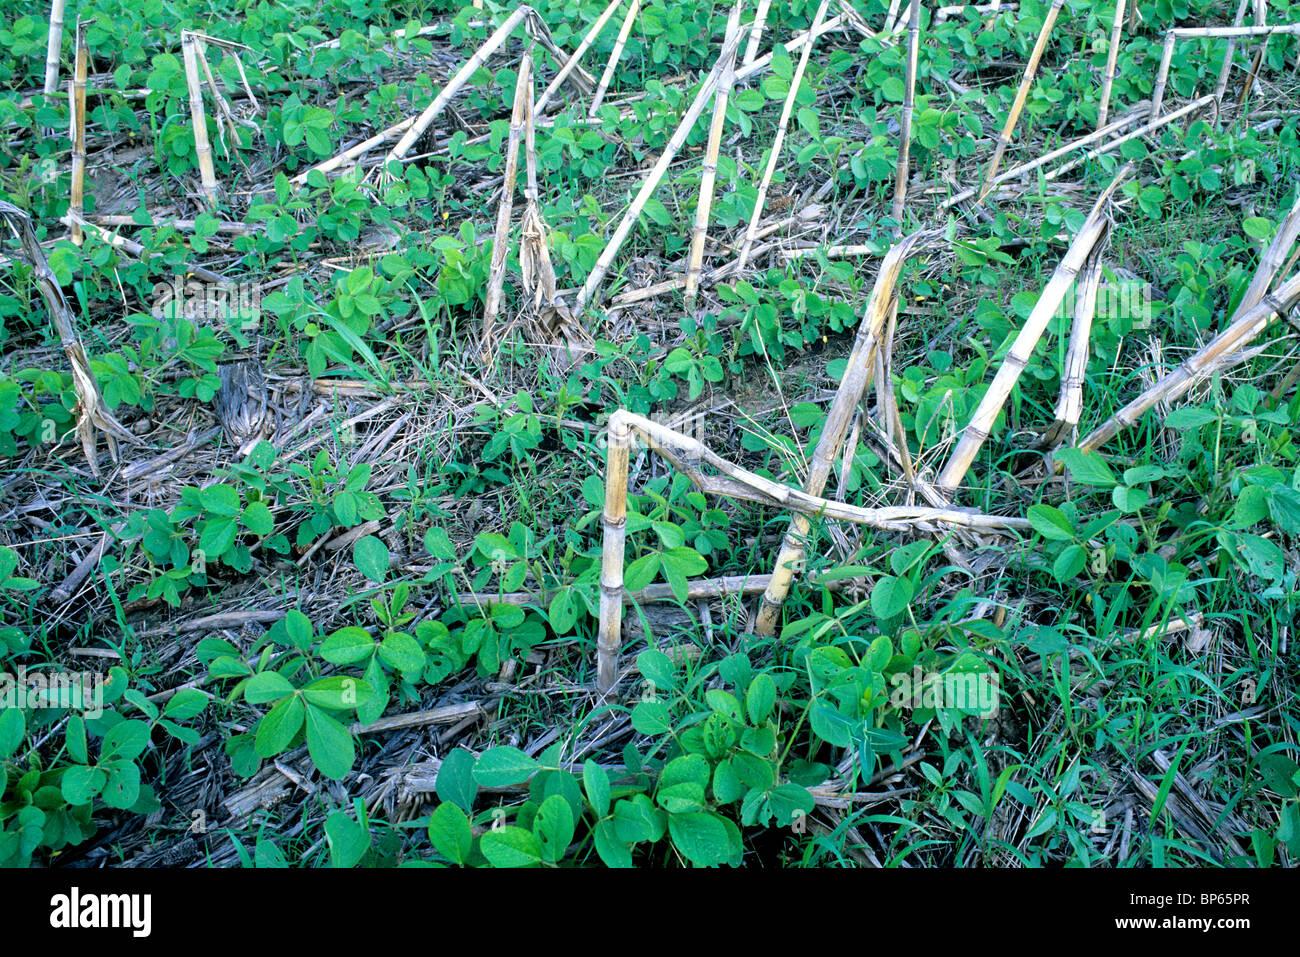 Soybean 'No Till' field, - Stock Image